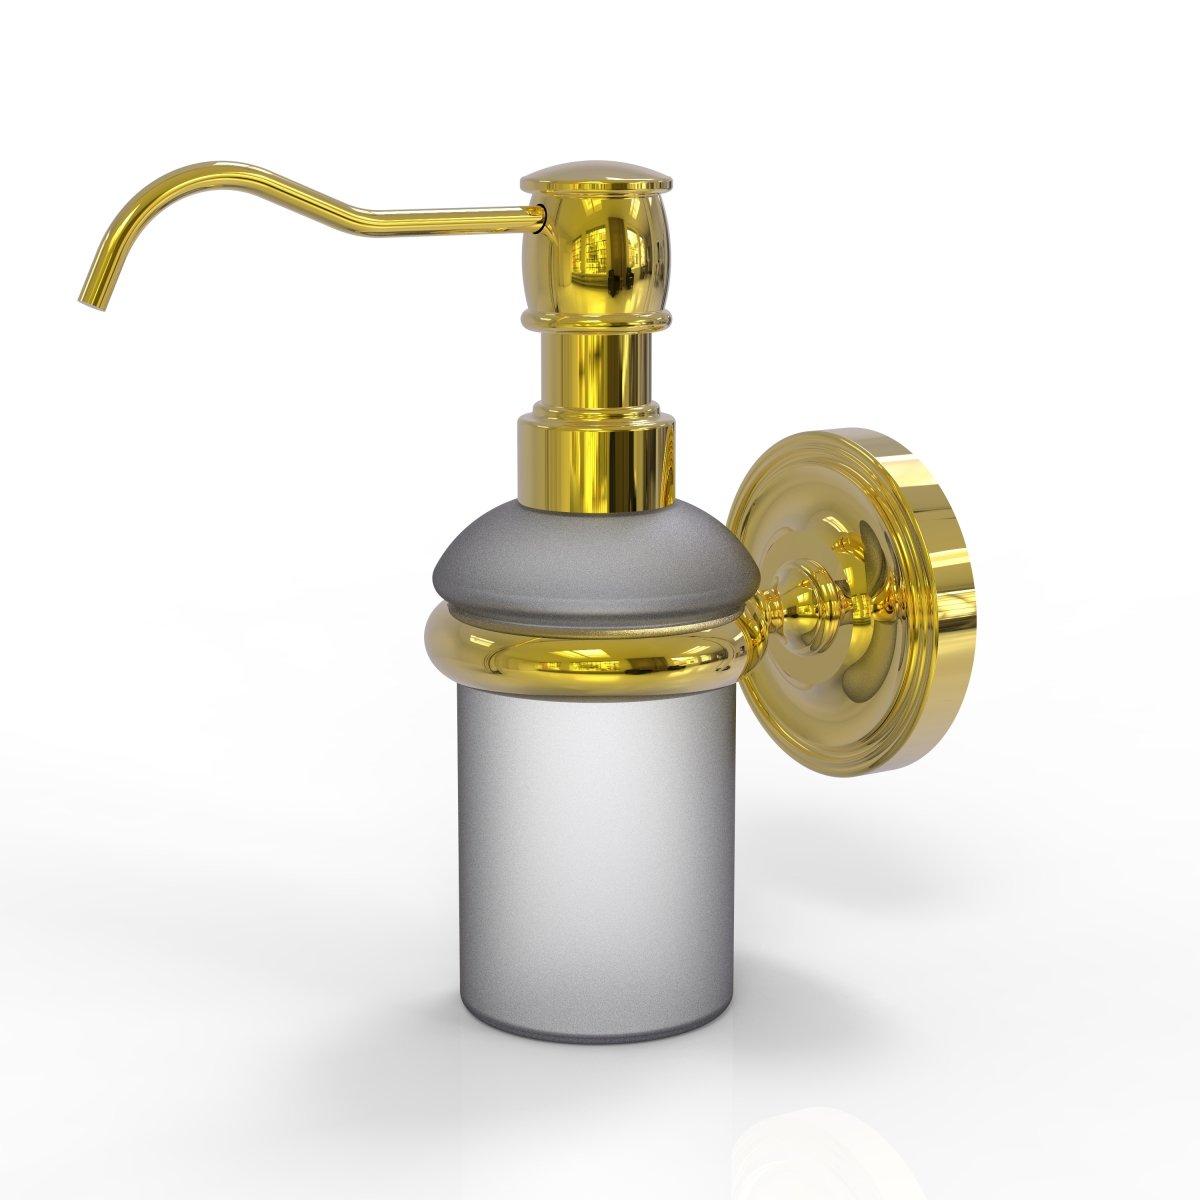 Allied真鍮Prestige Regal壁マウントソープディスペンサー PR-60-UNL B01N2WMMVDラッカーなし真鍮